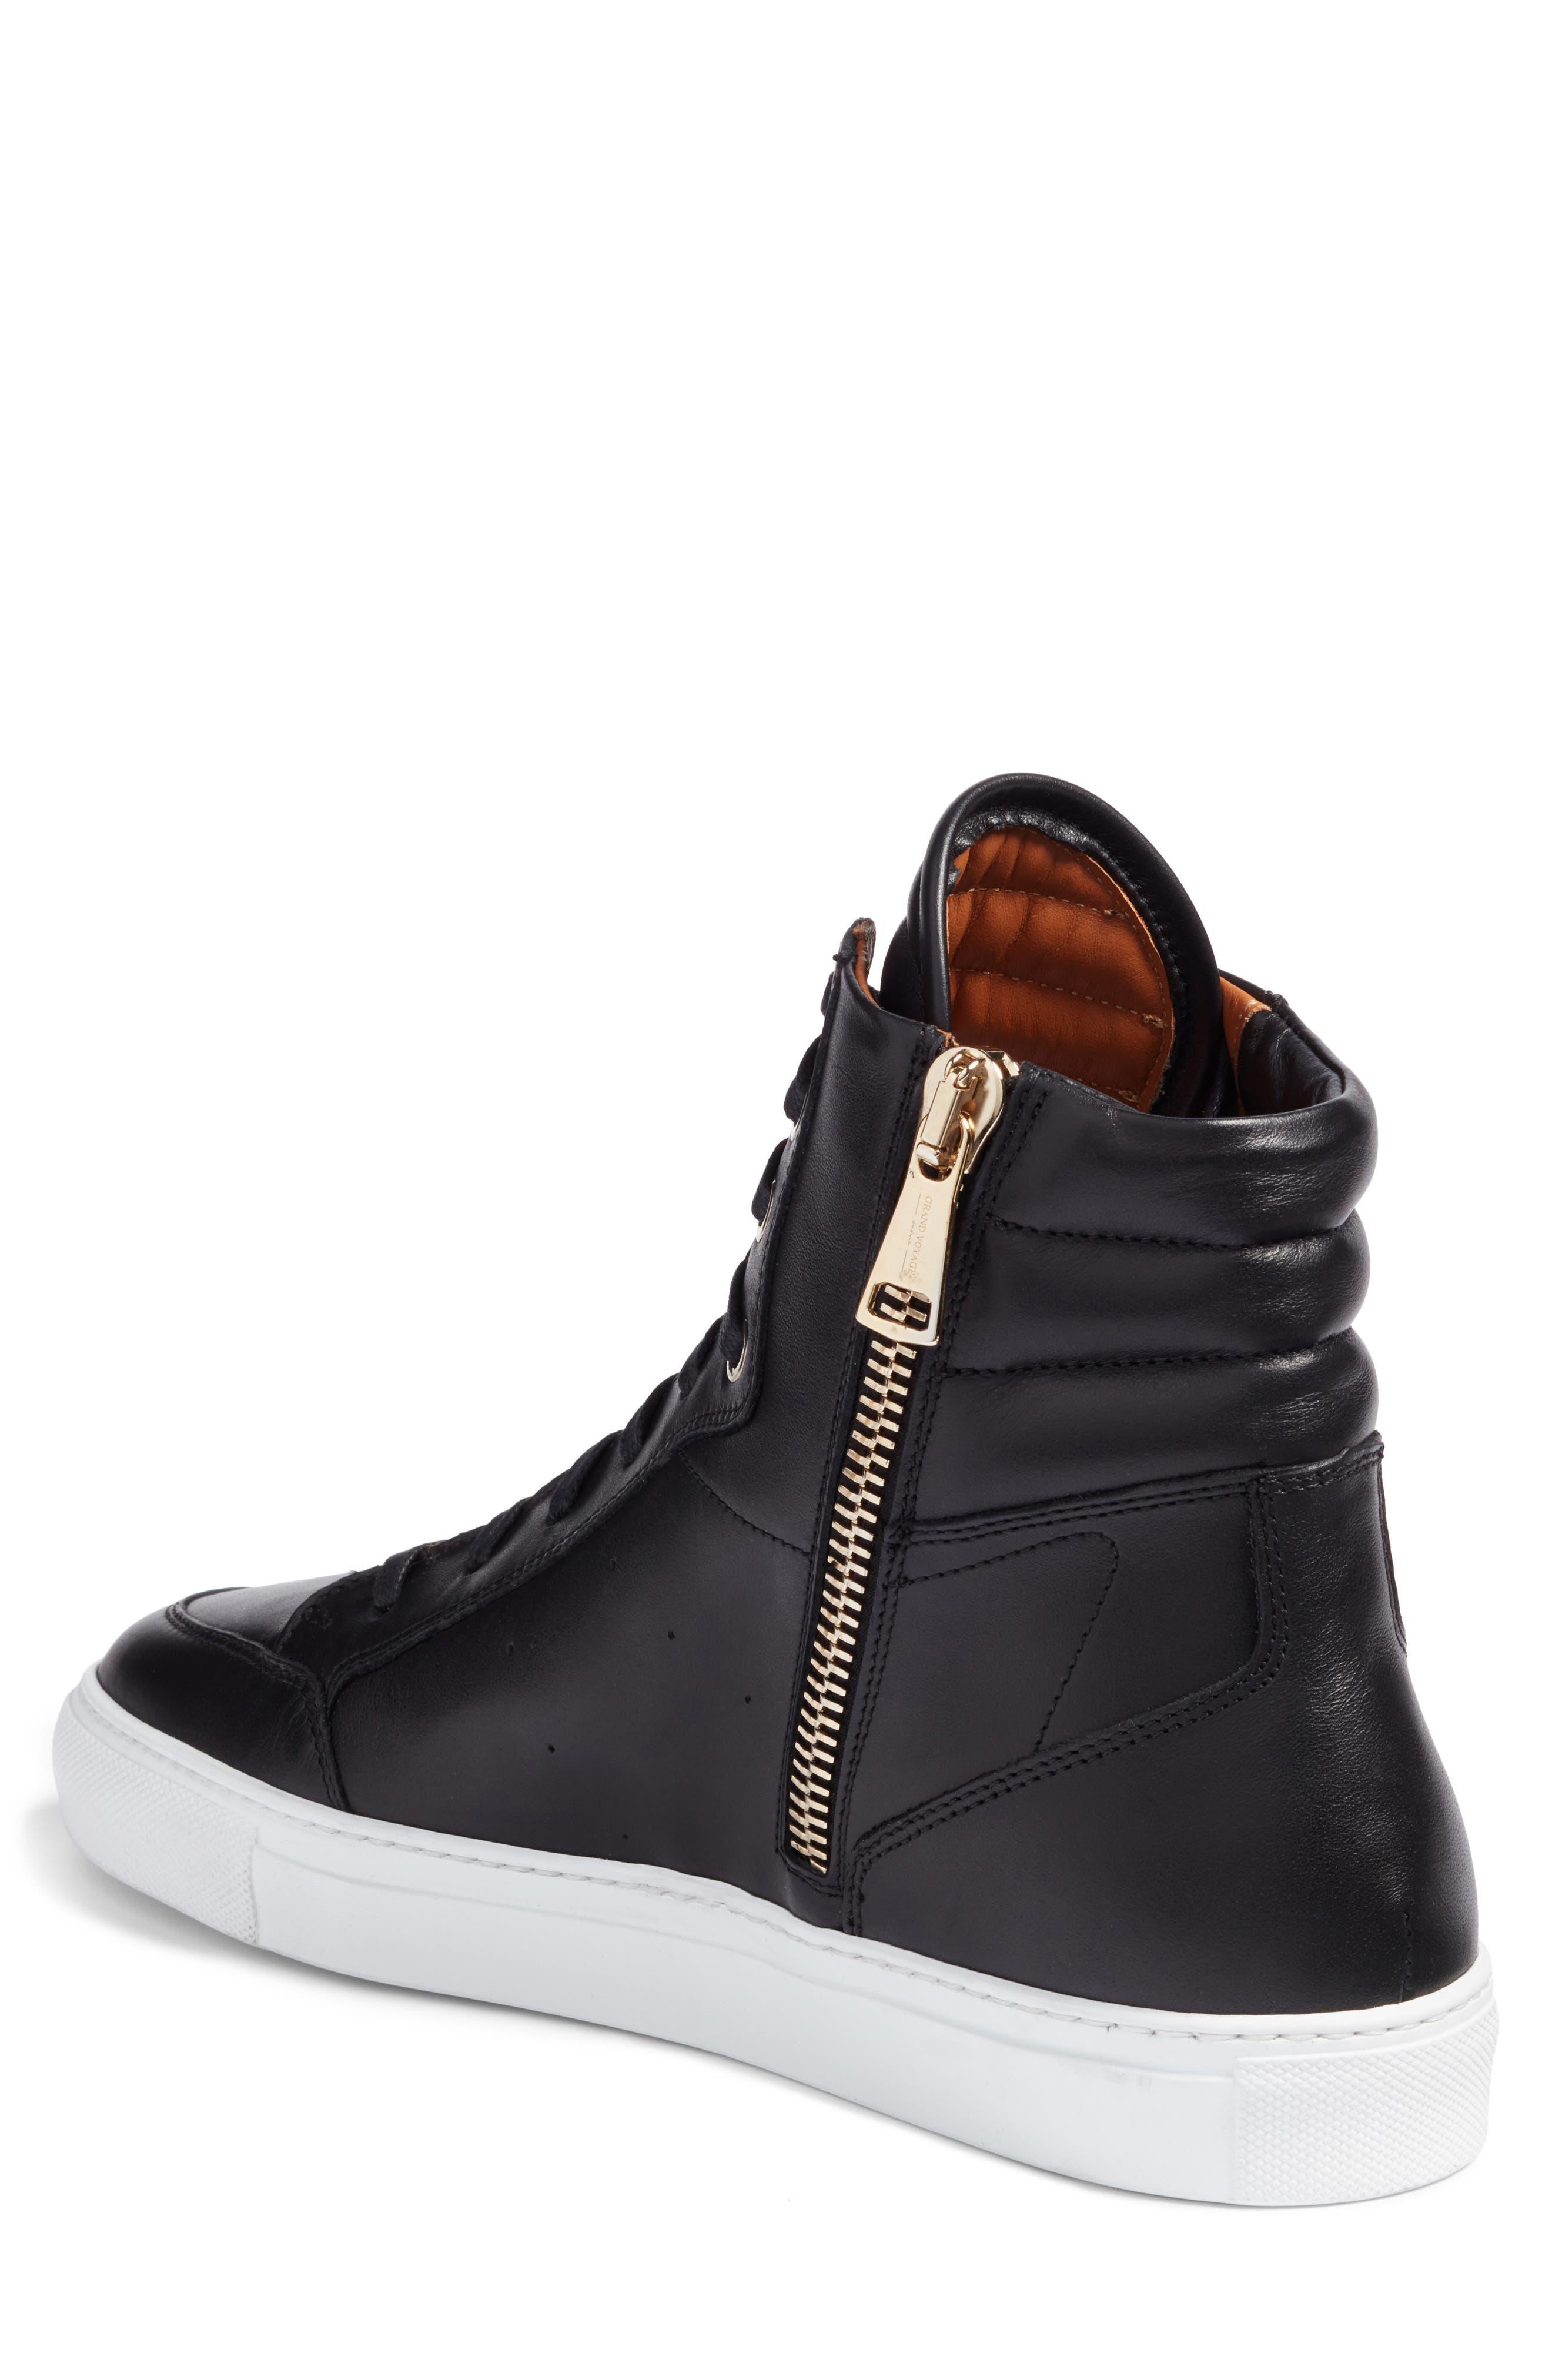 Alternate Image 2  - Grand Voyage Belmondo Sneaker (Men)